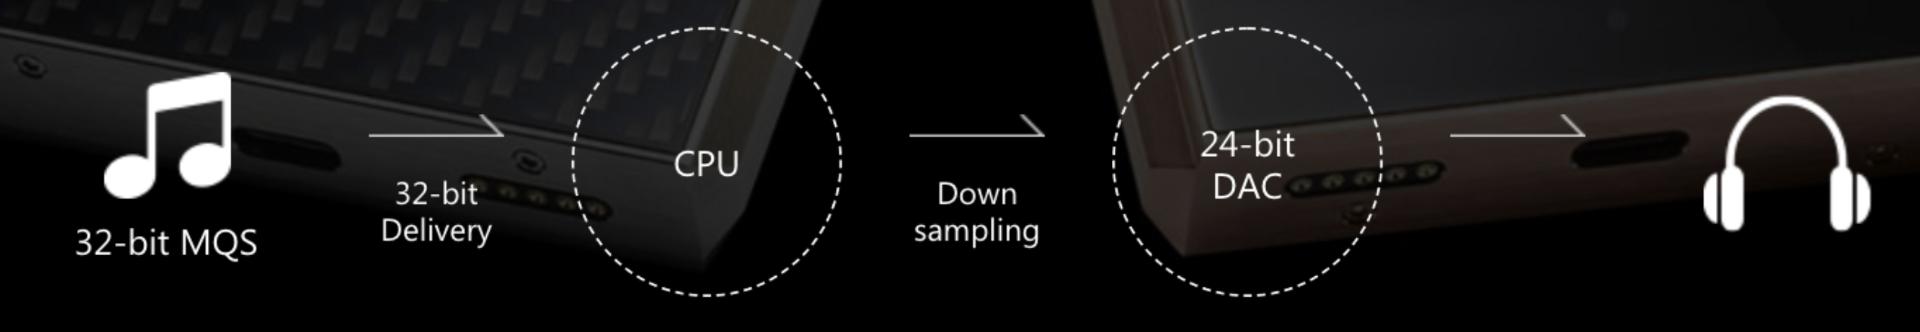 normal 32-bit playback downsampling